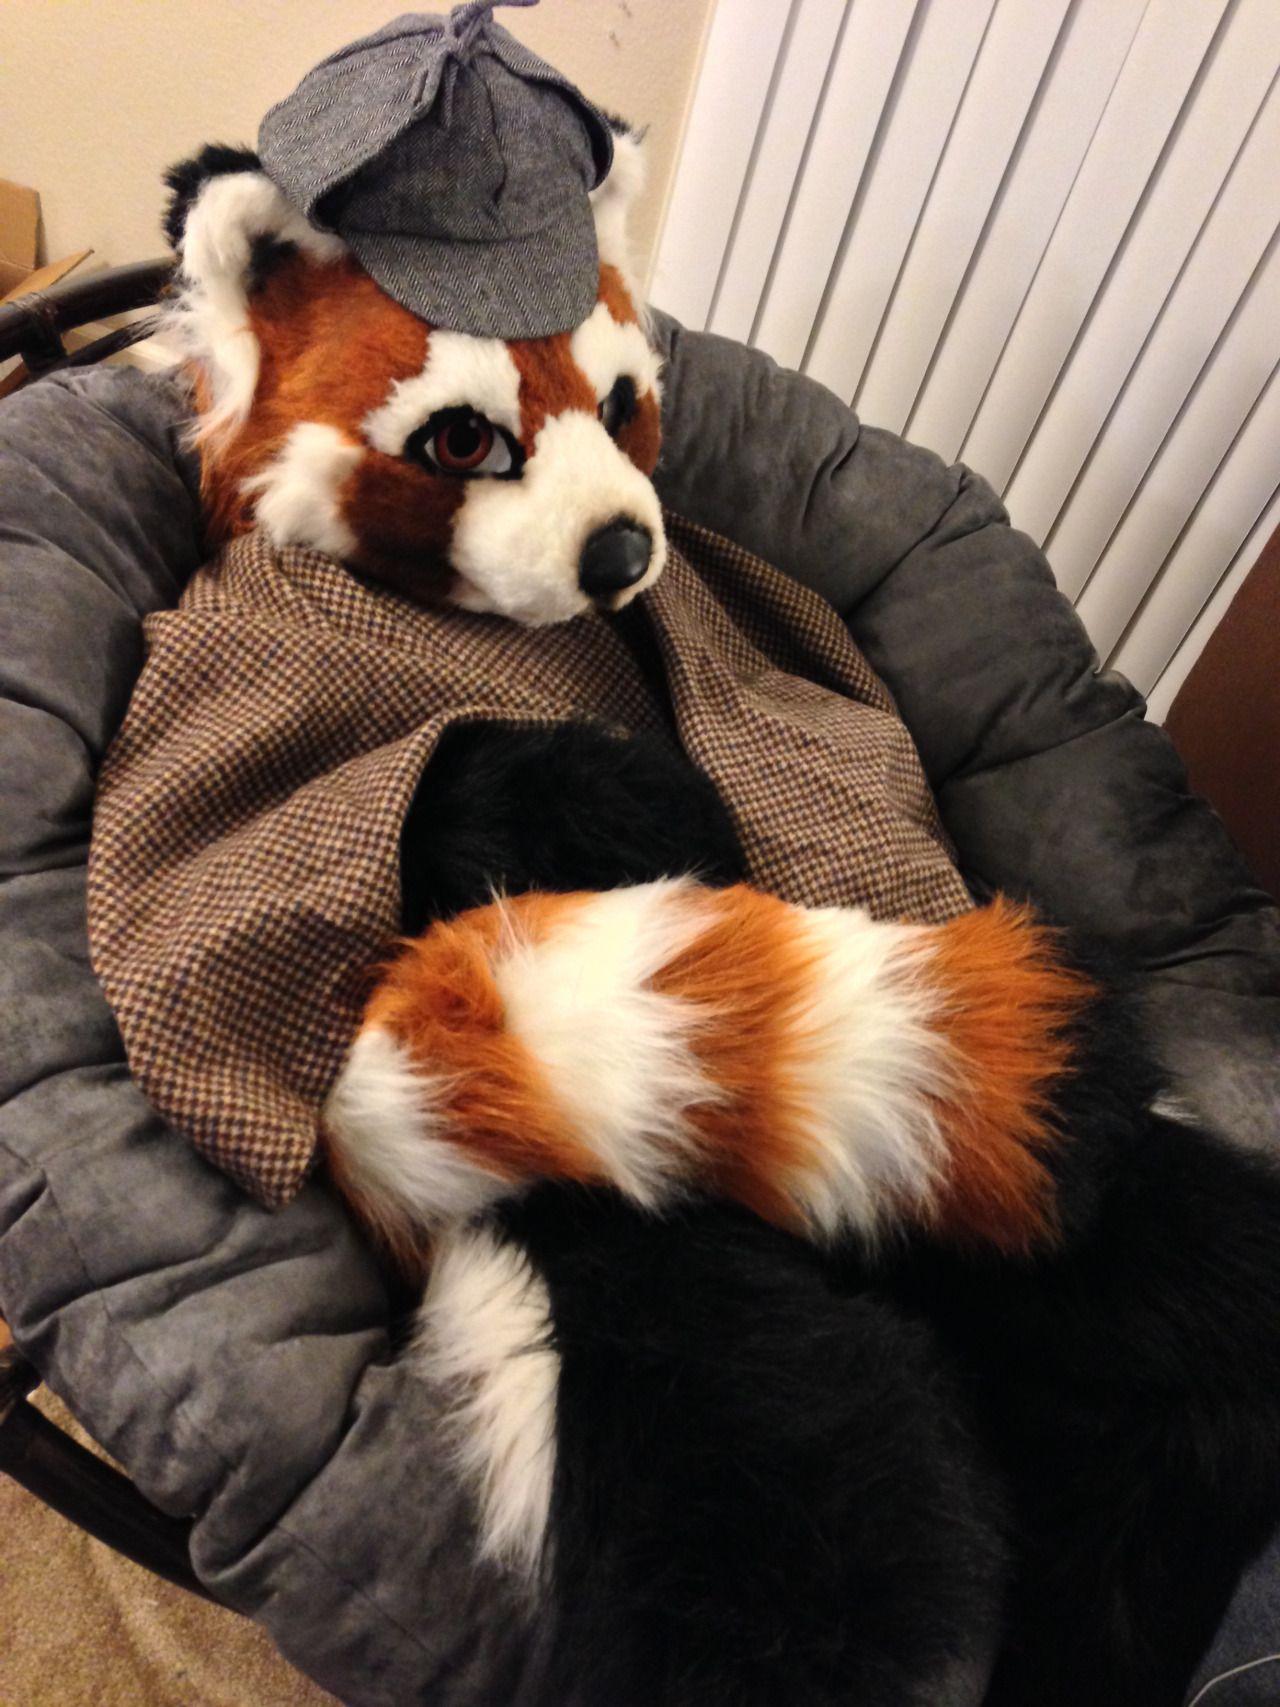 Fursuit Panda cosplay sherlock holmes red panda fursuit captain basil